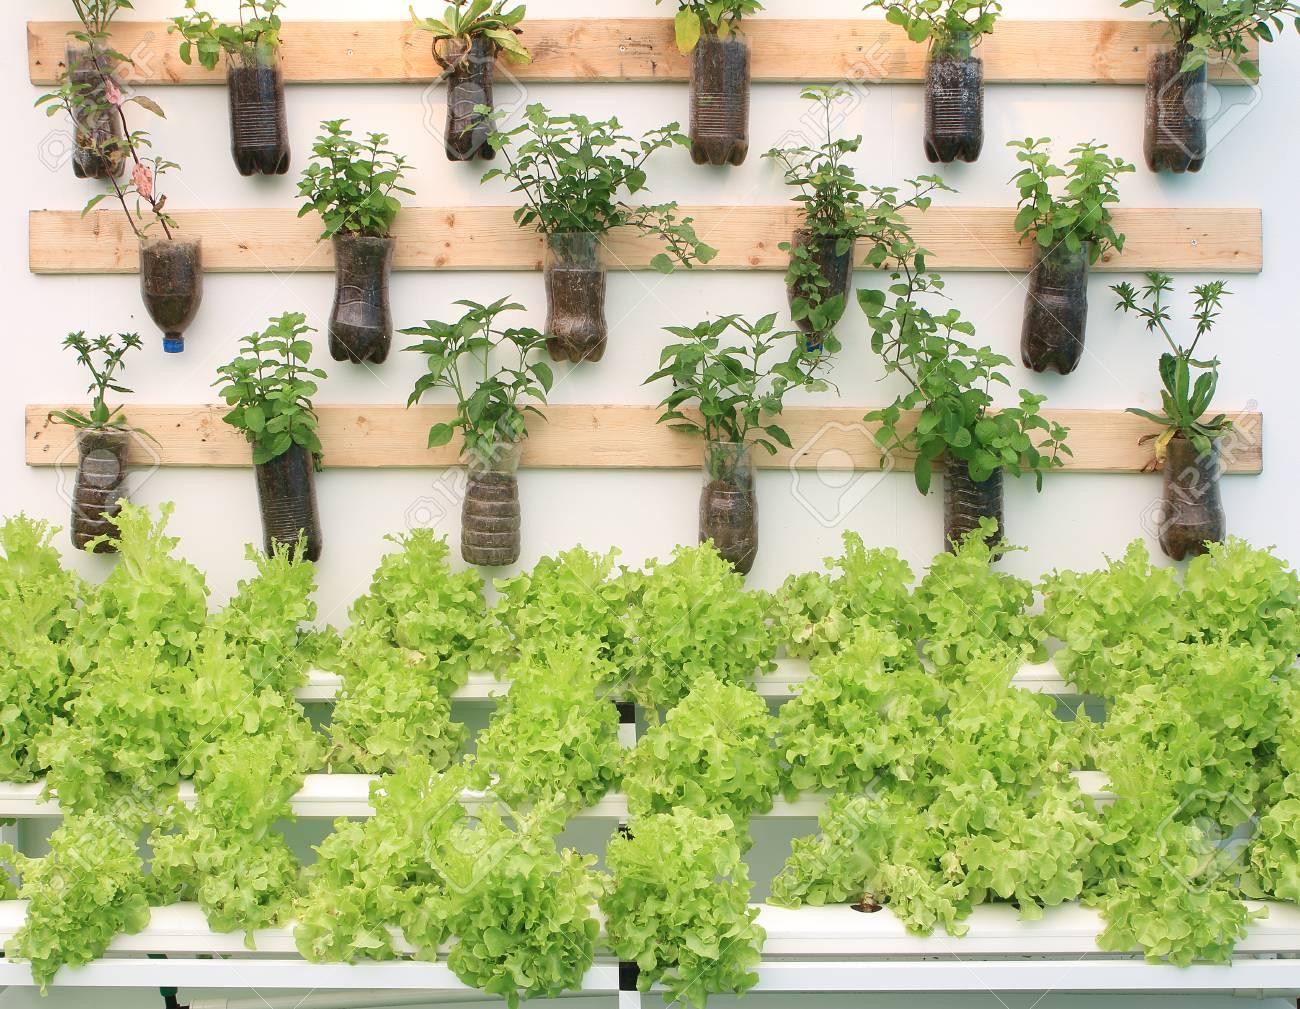 Beliebt Bevorzugt Pflanzen Kräuter In Töpfen An Die Wand Hängen. Lizenzfreie Fotos &US_73